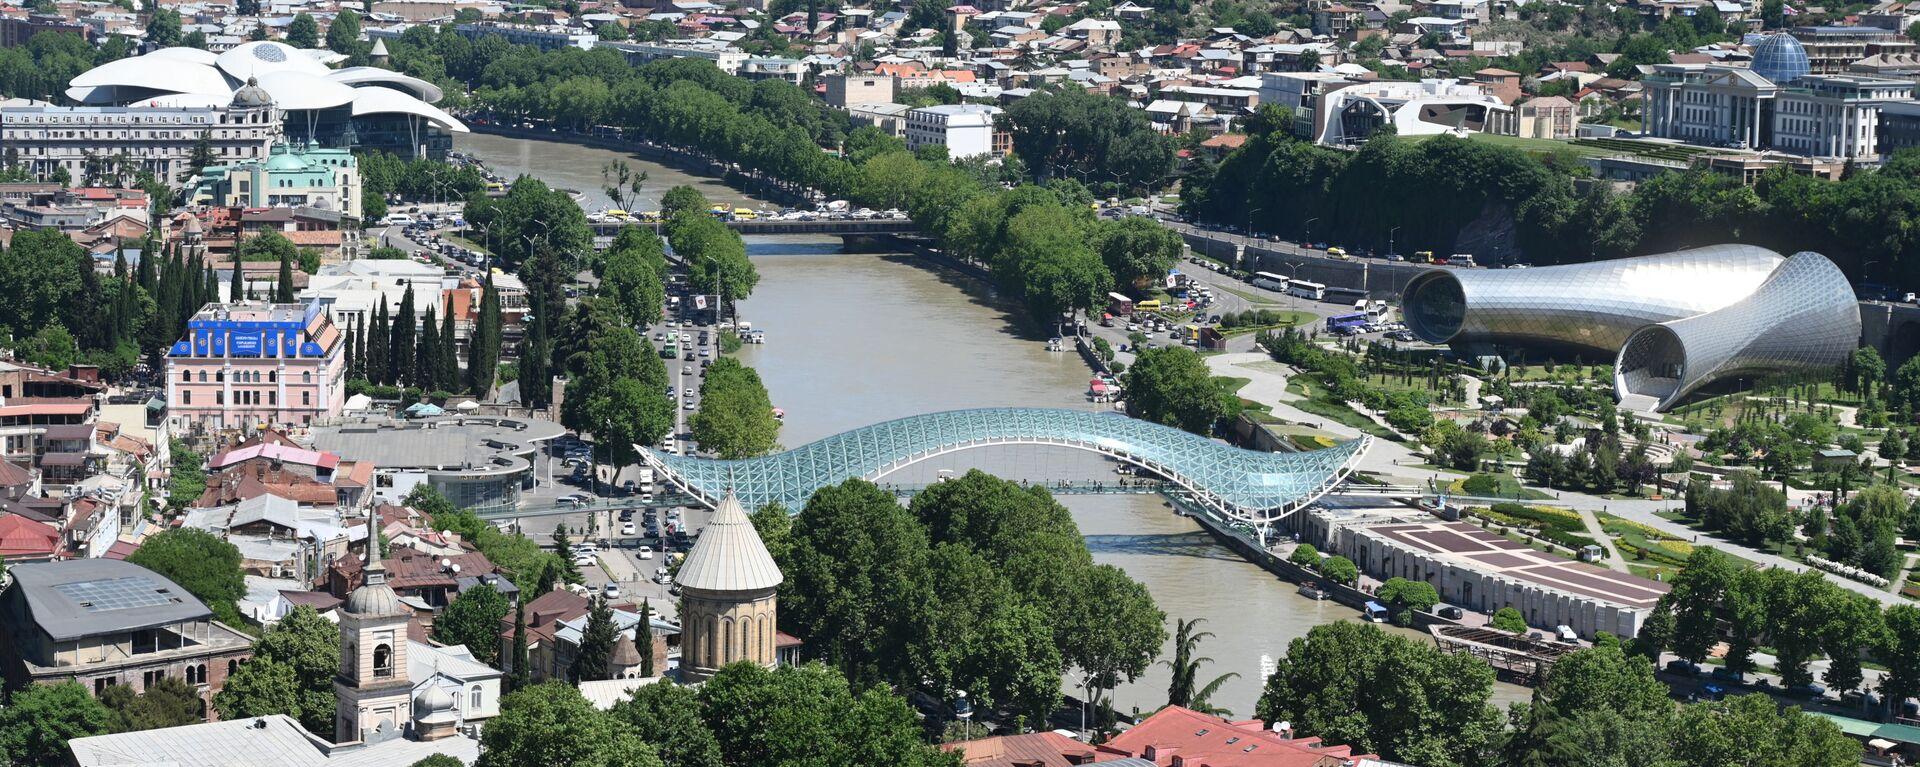 Gruzja, Tbilisi - Sputnik Polska, 1920, 31.07.2021